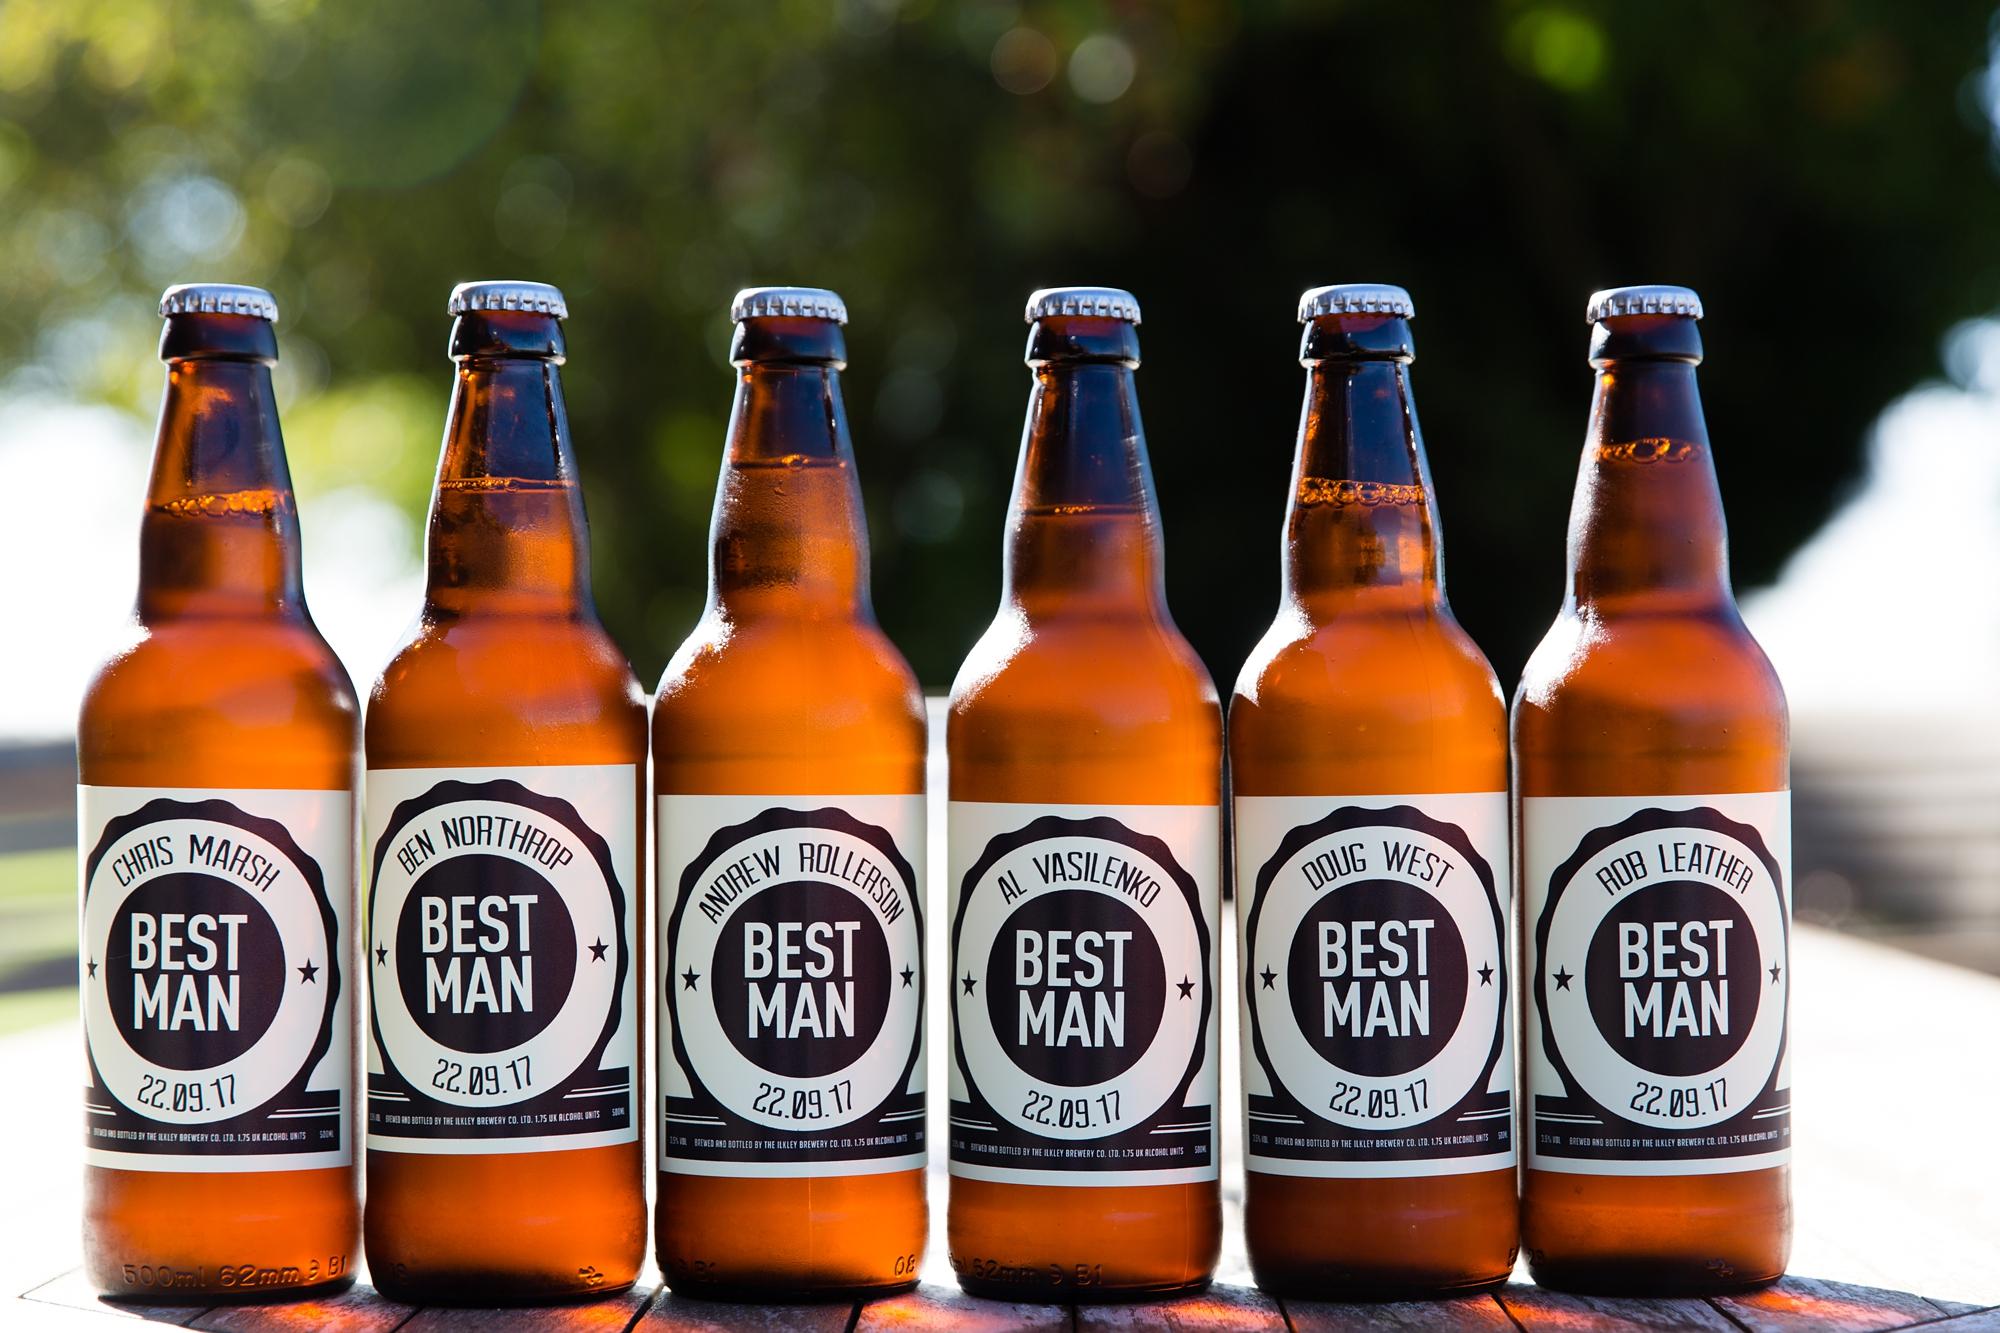 York Wedding Photography at Barmbyfield Barns beer bottles